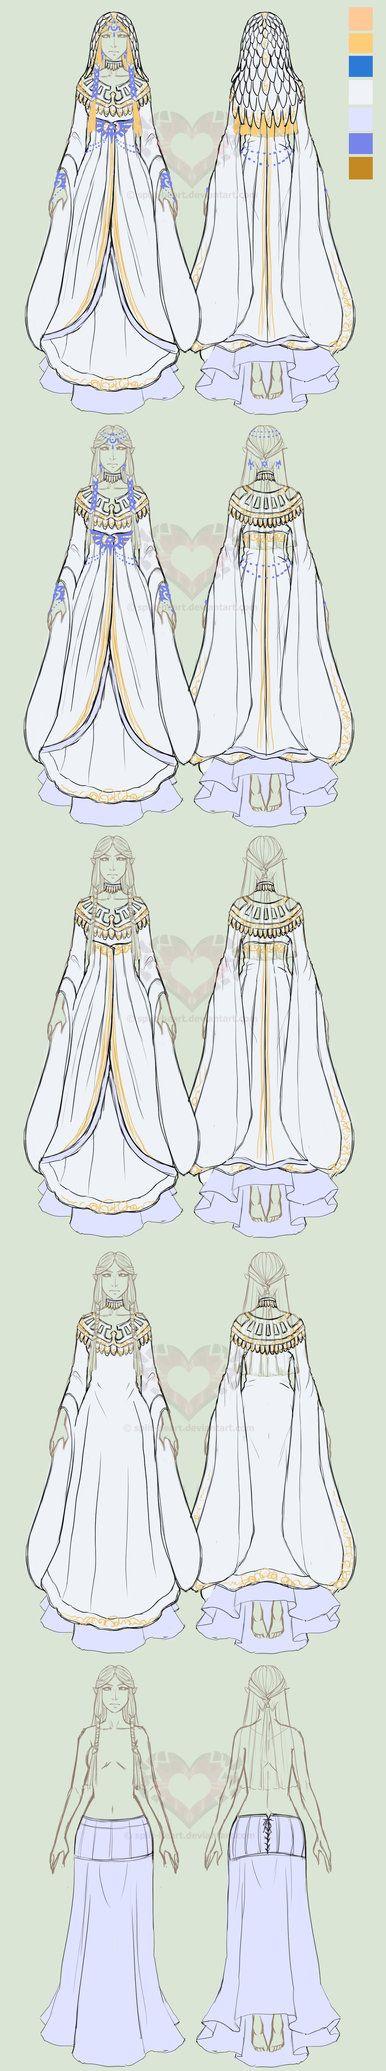 Hylia's robe